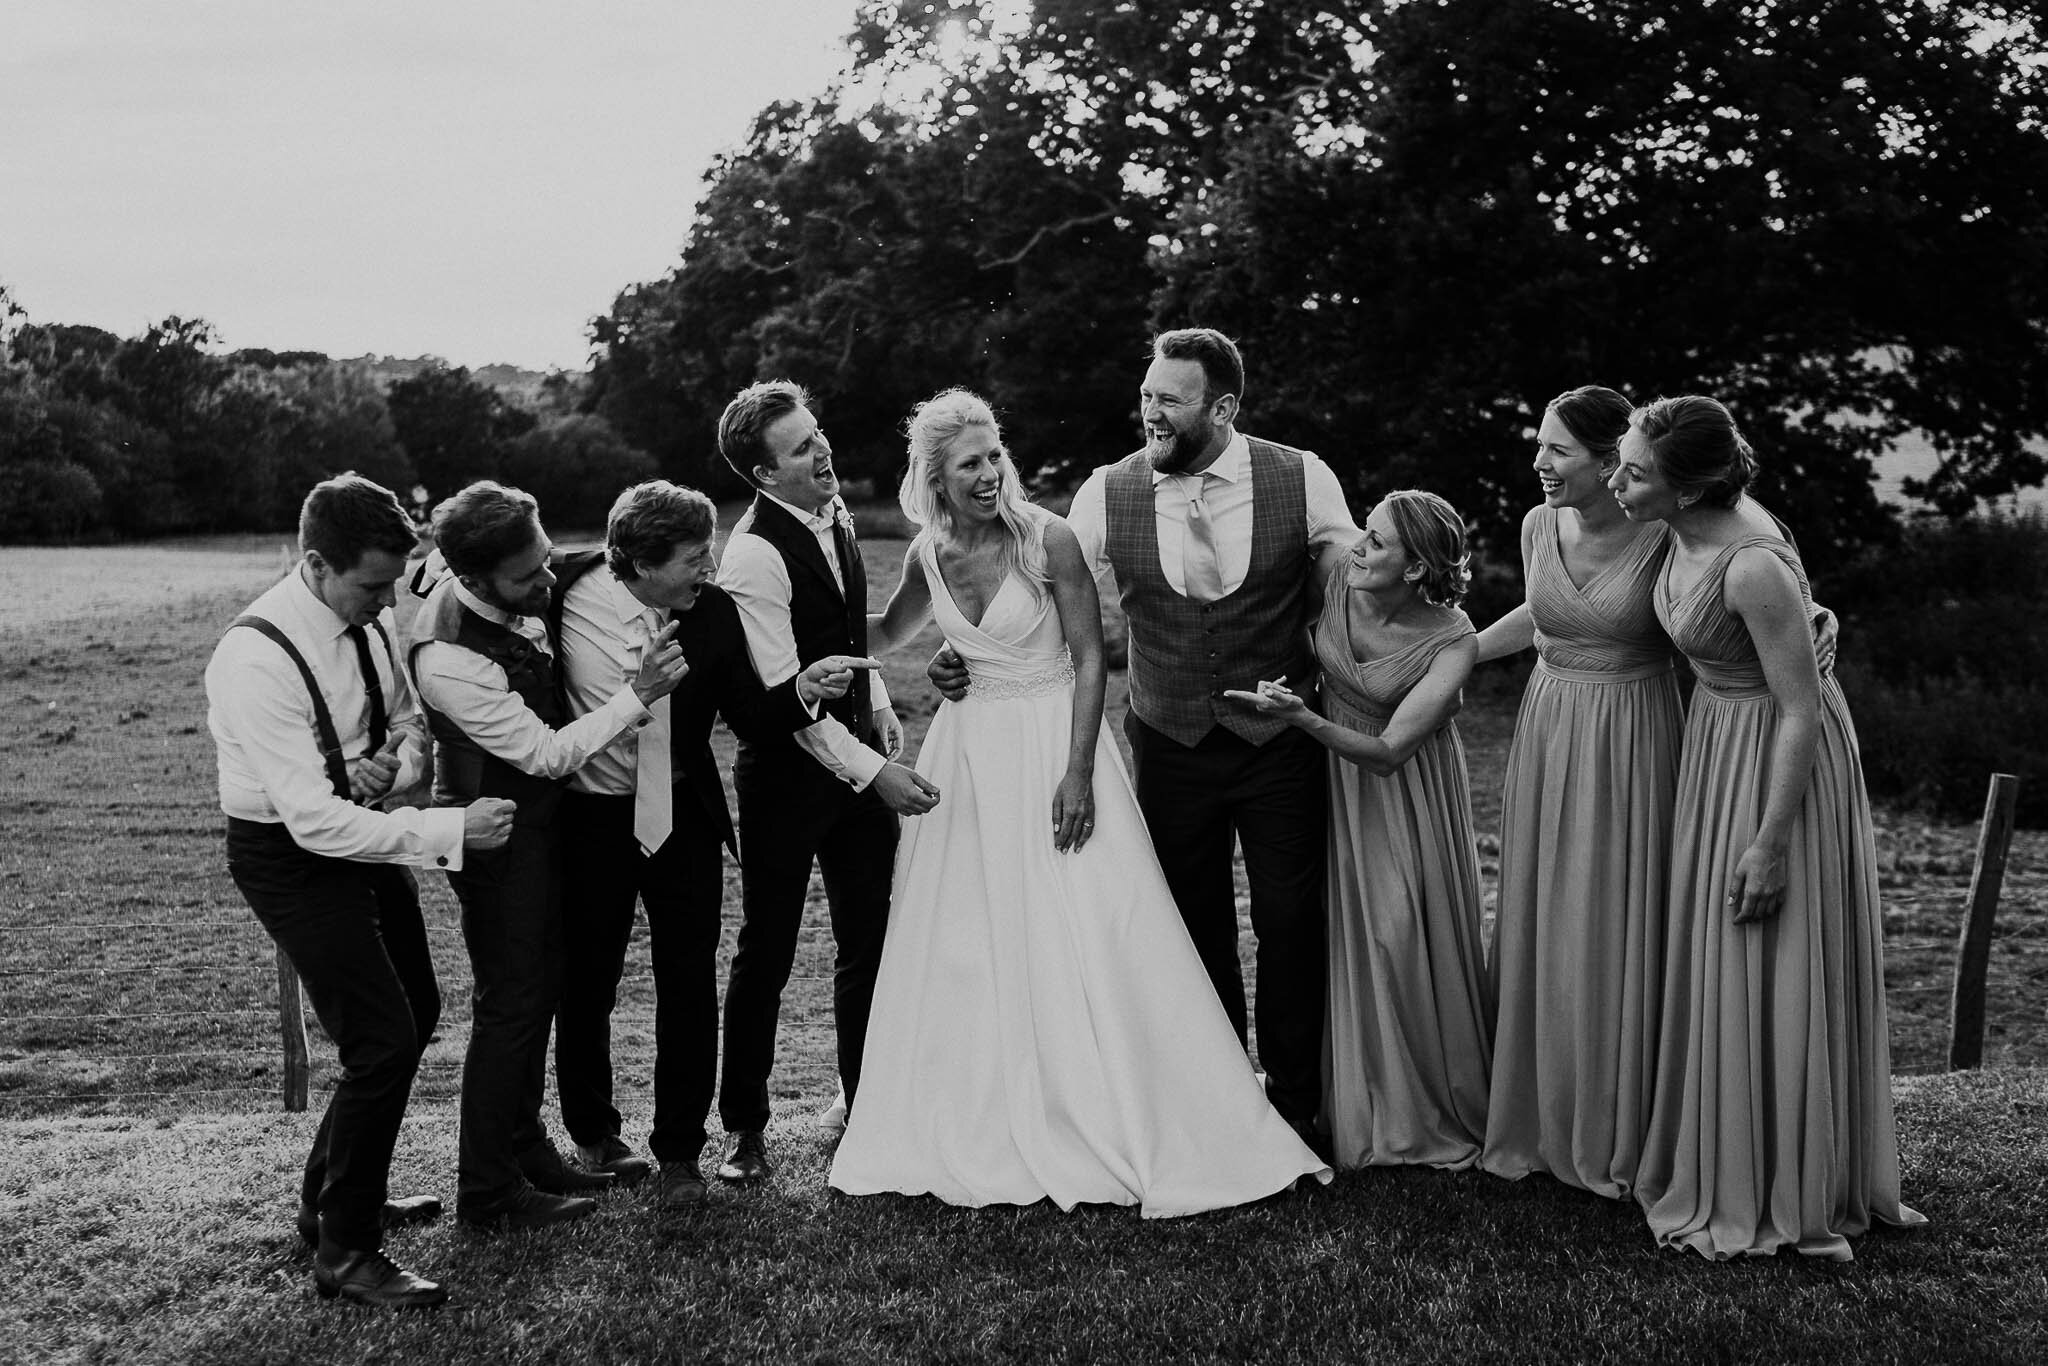 bridesmaids-and-groomsmen-portraits